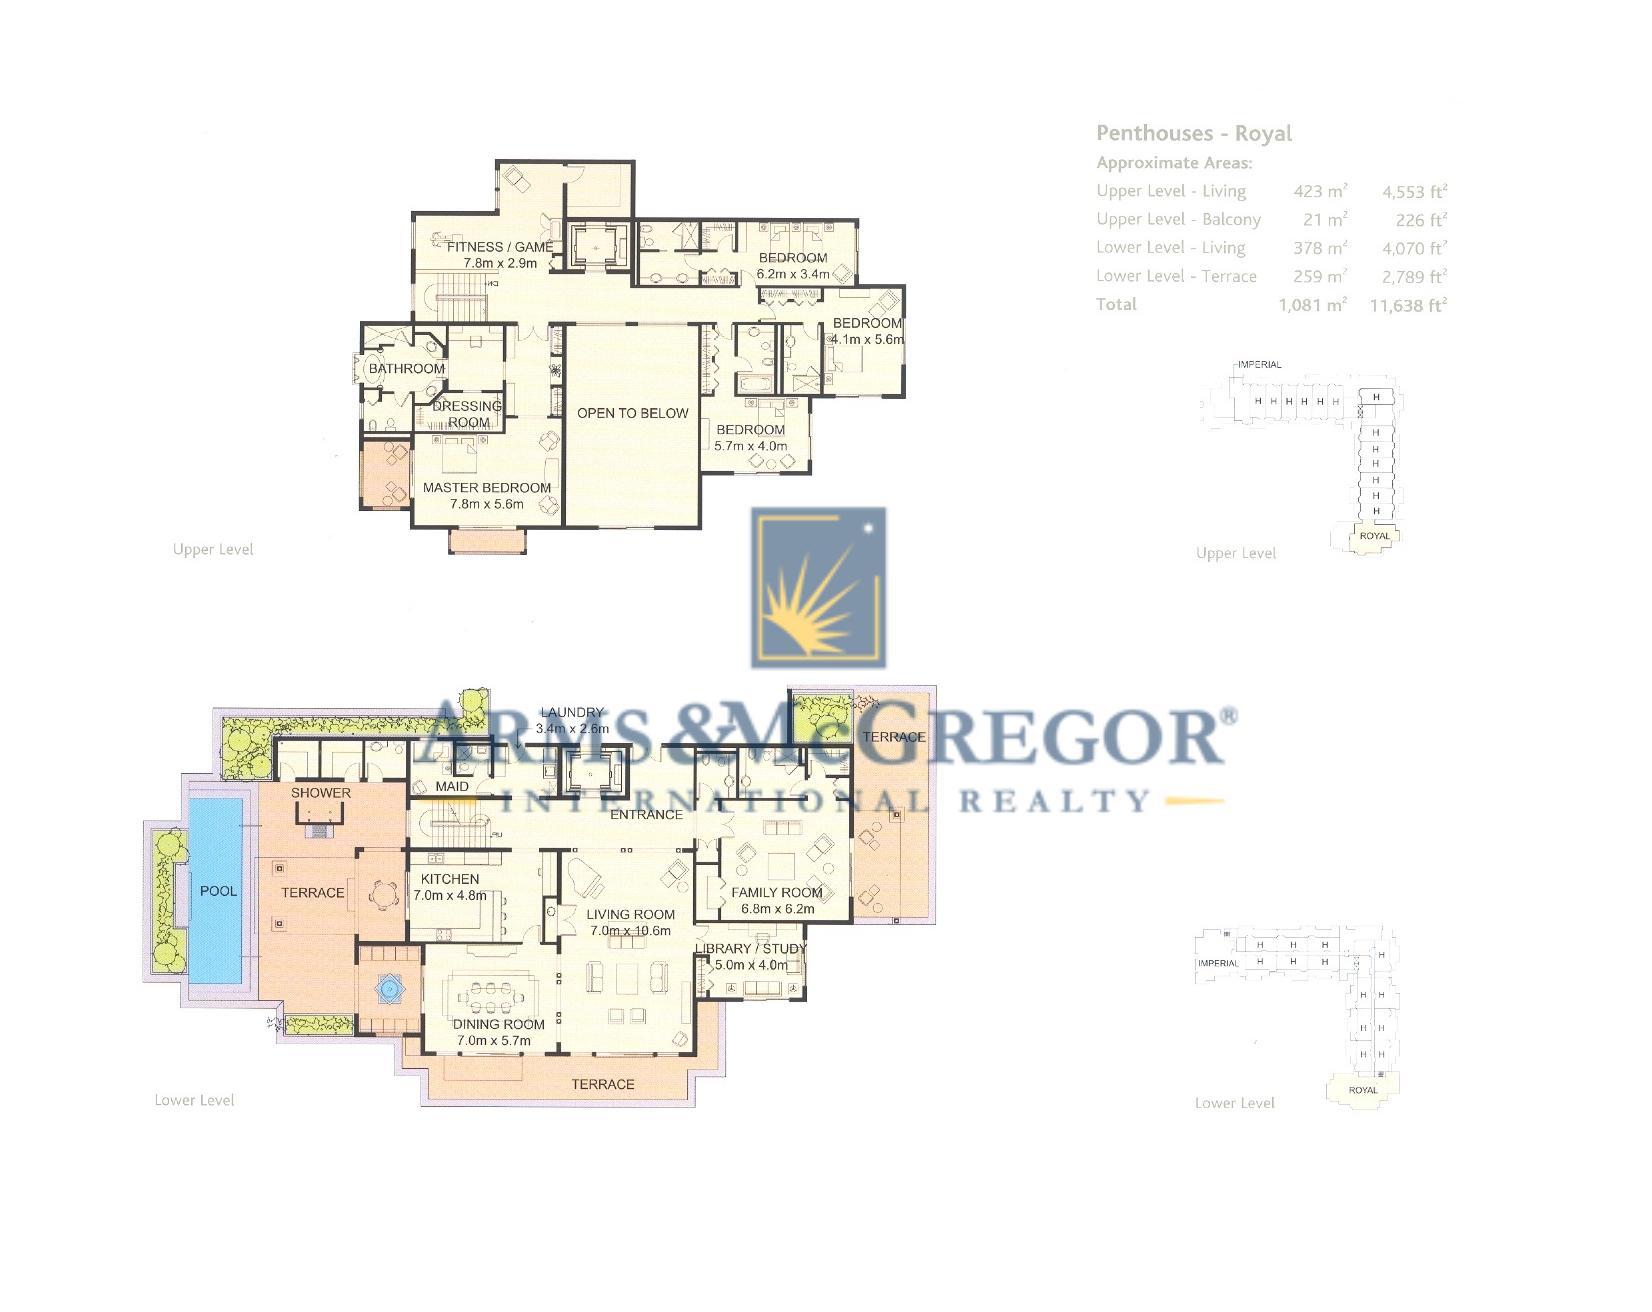 4 br penthouse royal